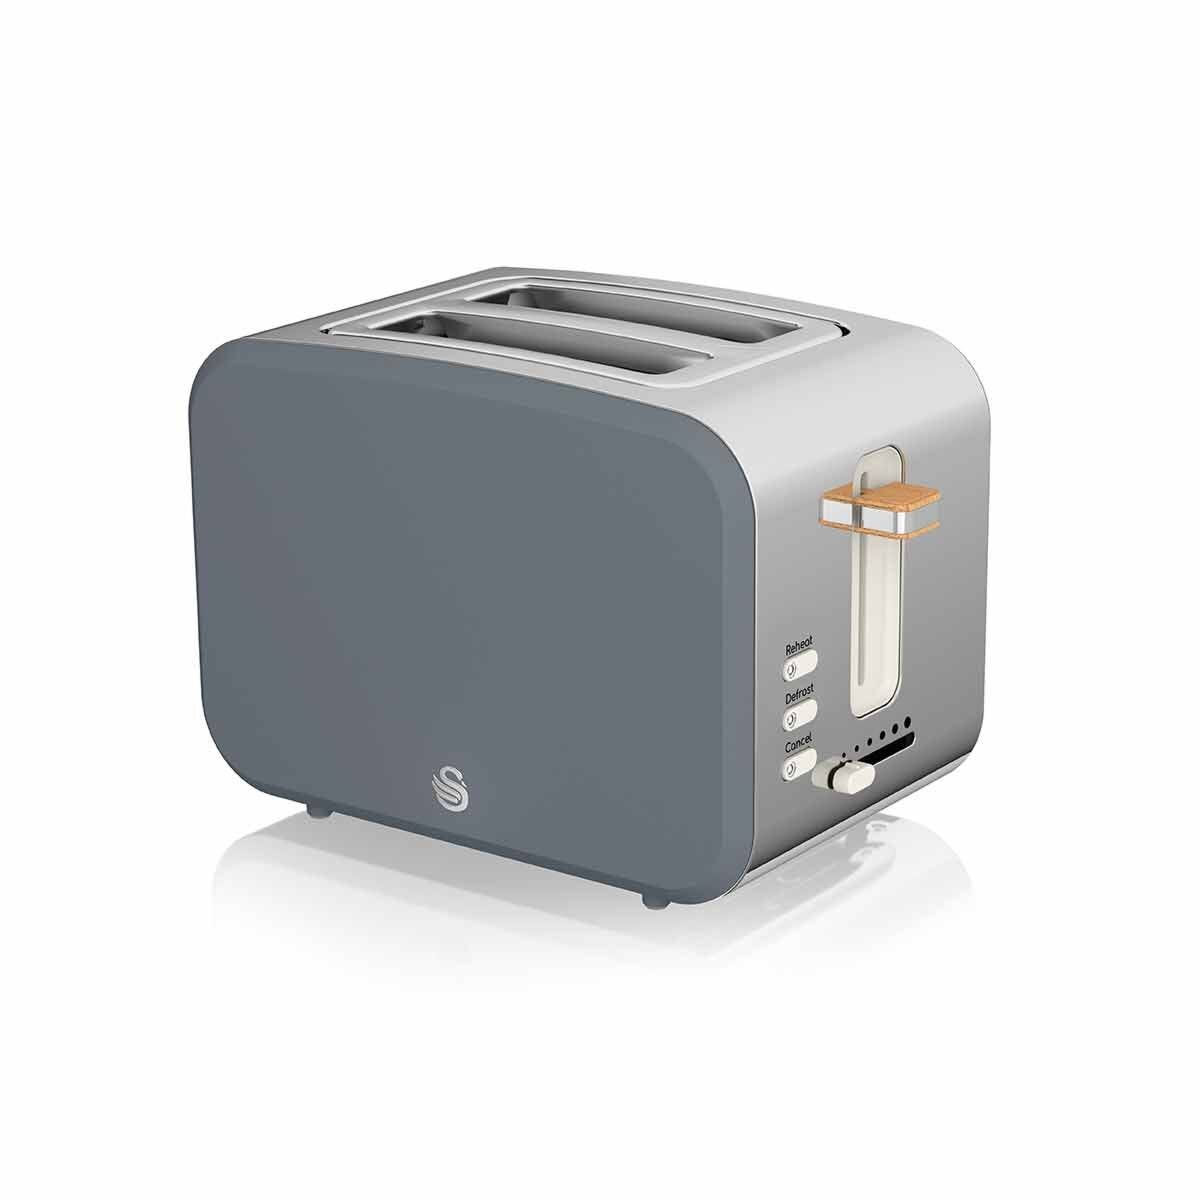 Swan 2 Slice Nordic Toaster 900W